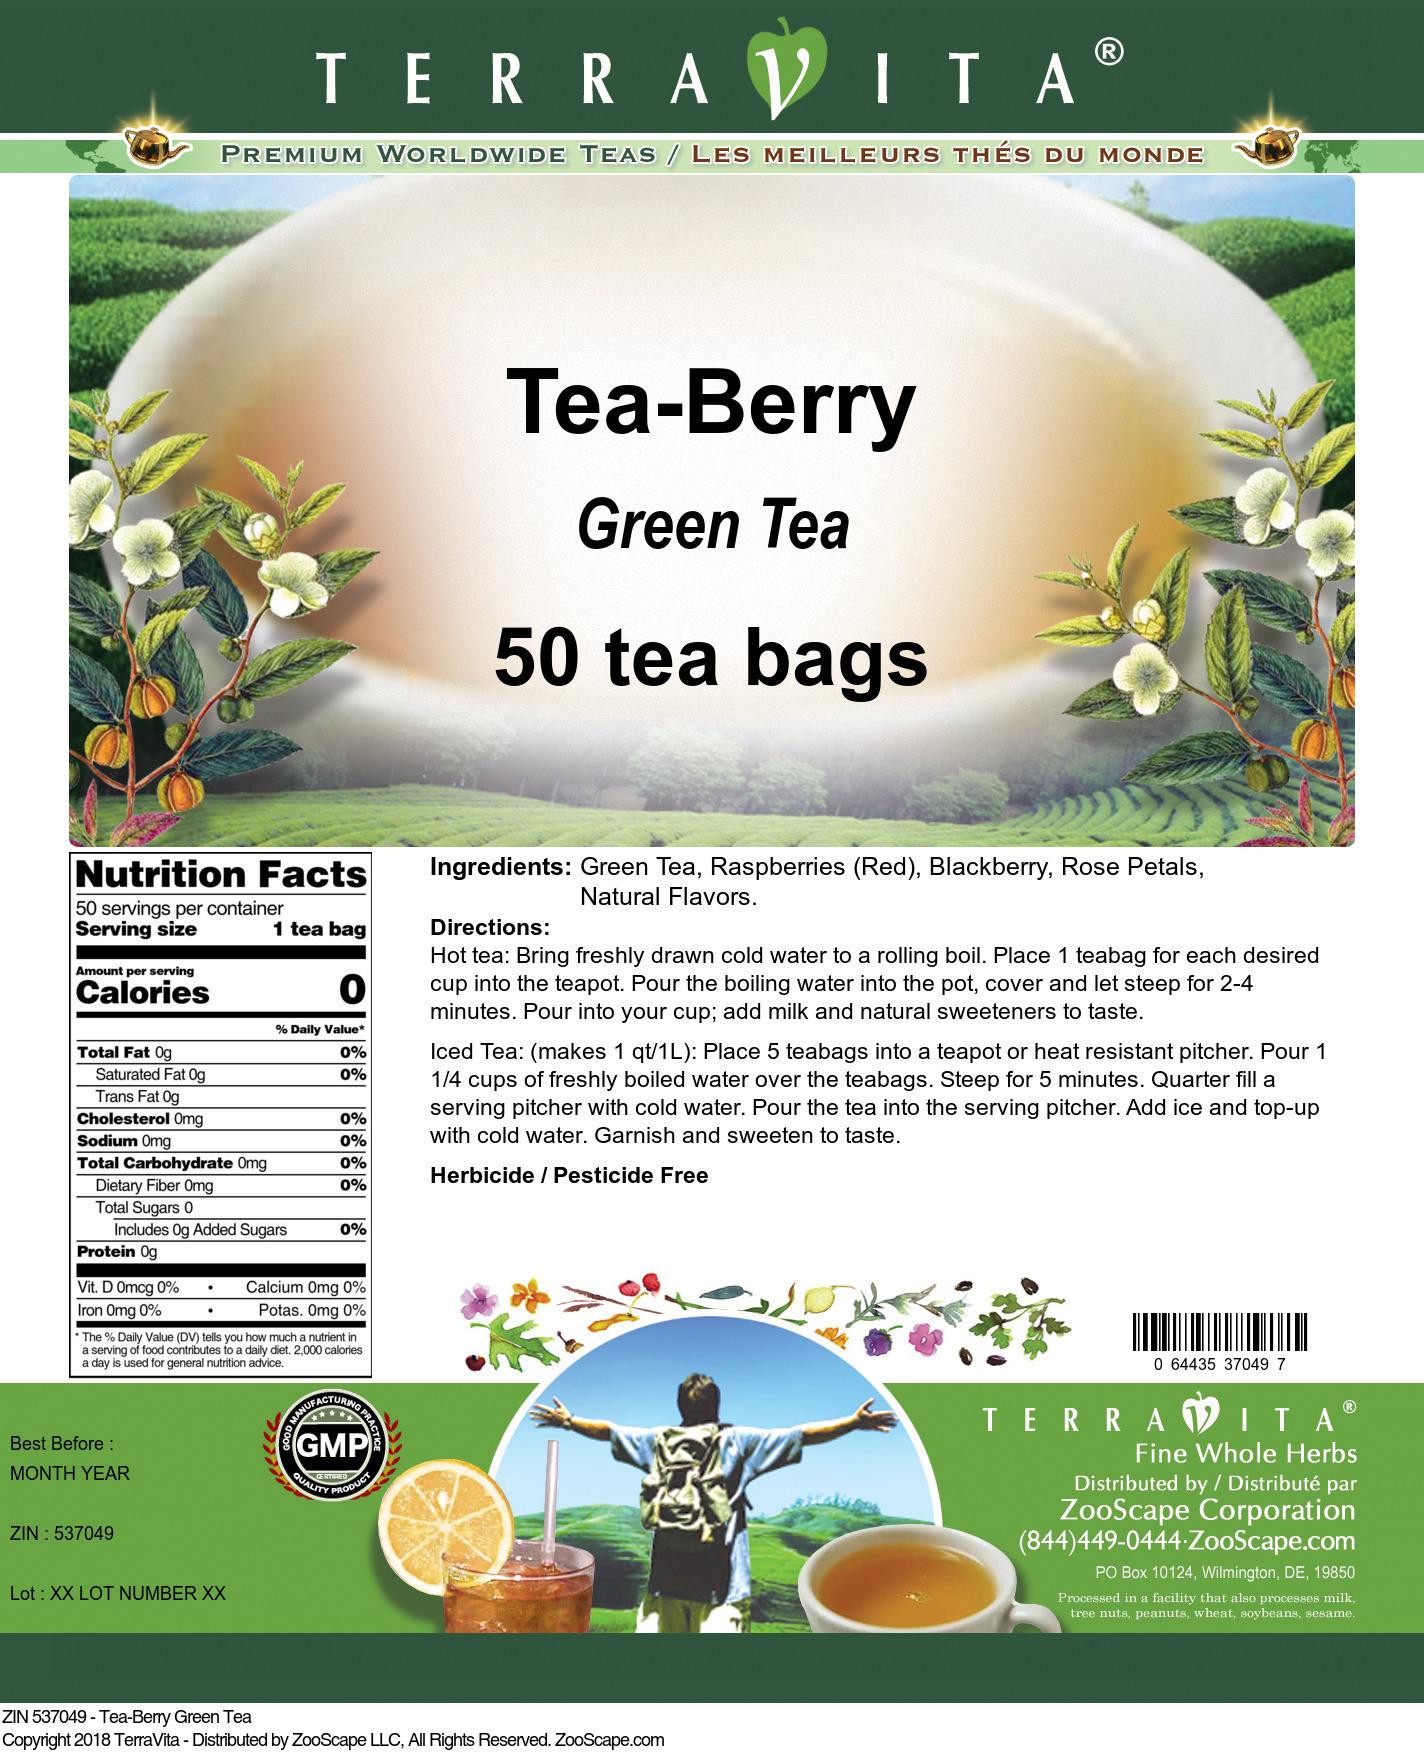 Tea-Berry Green Tea